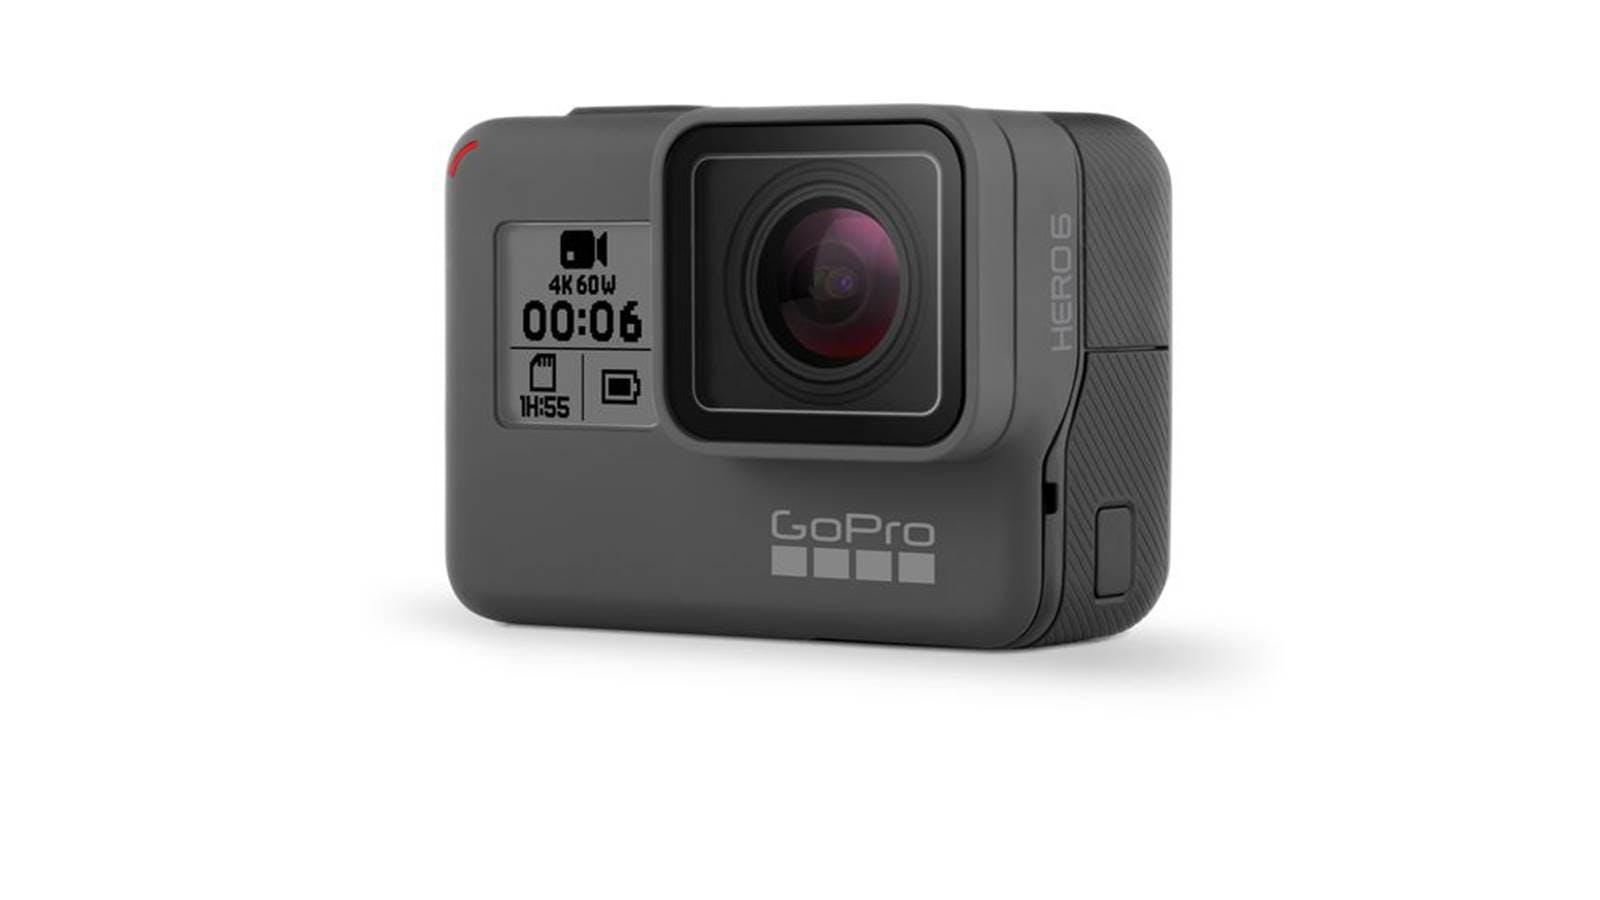 GoPro Hero 6 Black Action Camera Product GoPro Hero 6 Black 運動攝影機的缺點?